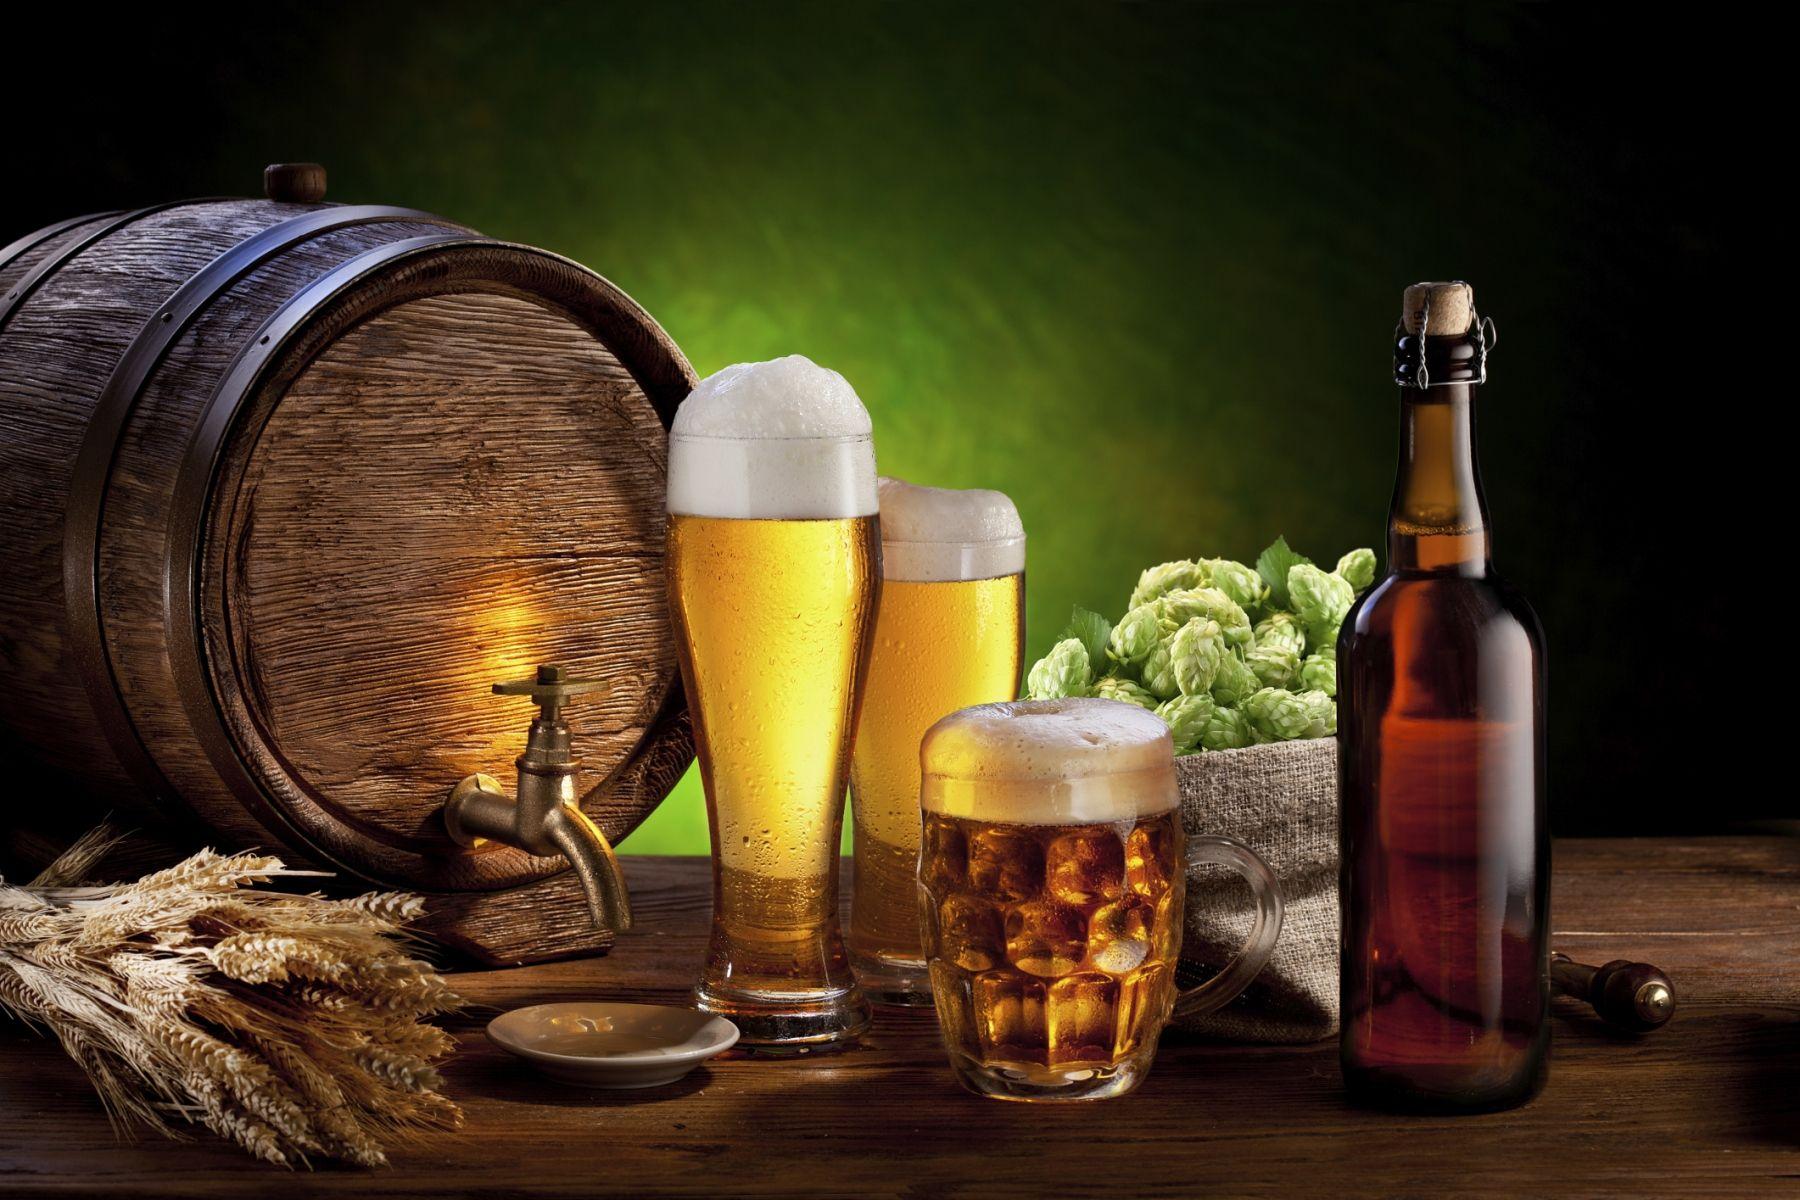 7 Razones Para Tomar Cerveza Con Imágenes Cerveza Artesanal Cerveza Casera Como Fabricar Cerveza